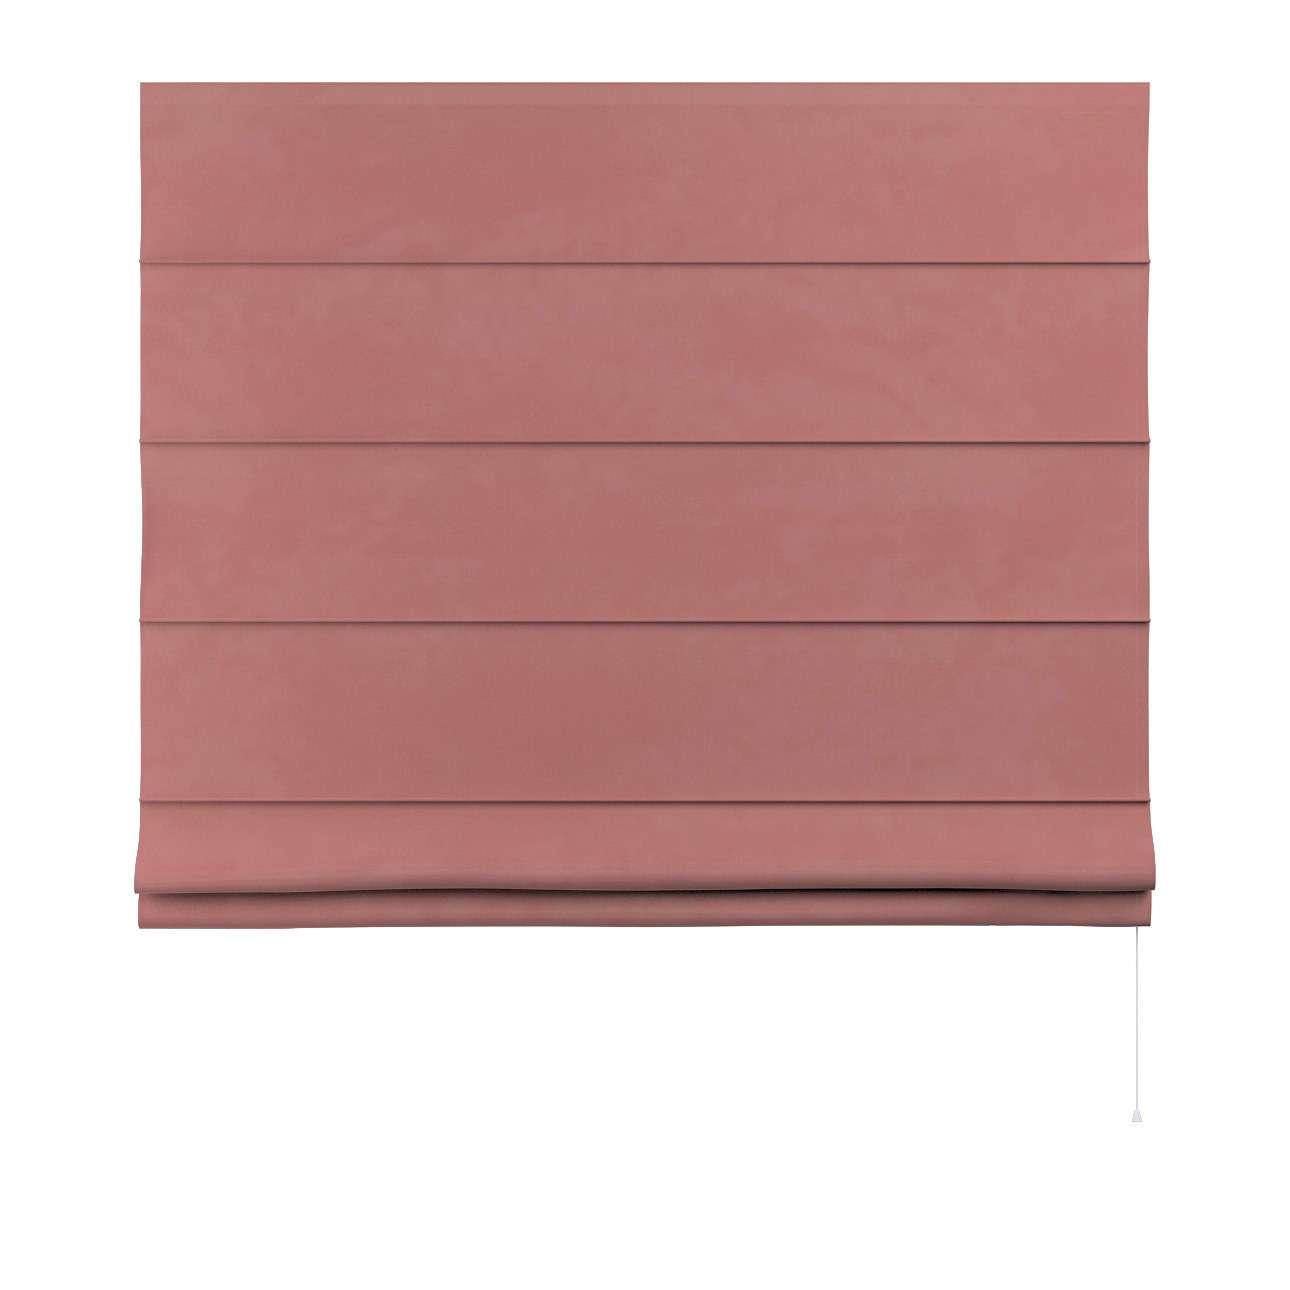 Rímska roleta Capri V kolekcii Velvet, tkanina: 704-30